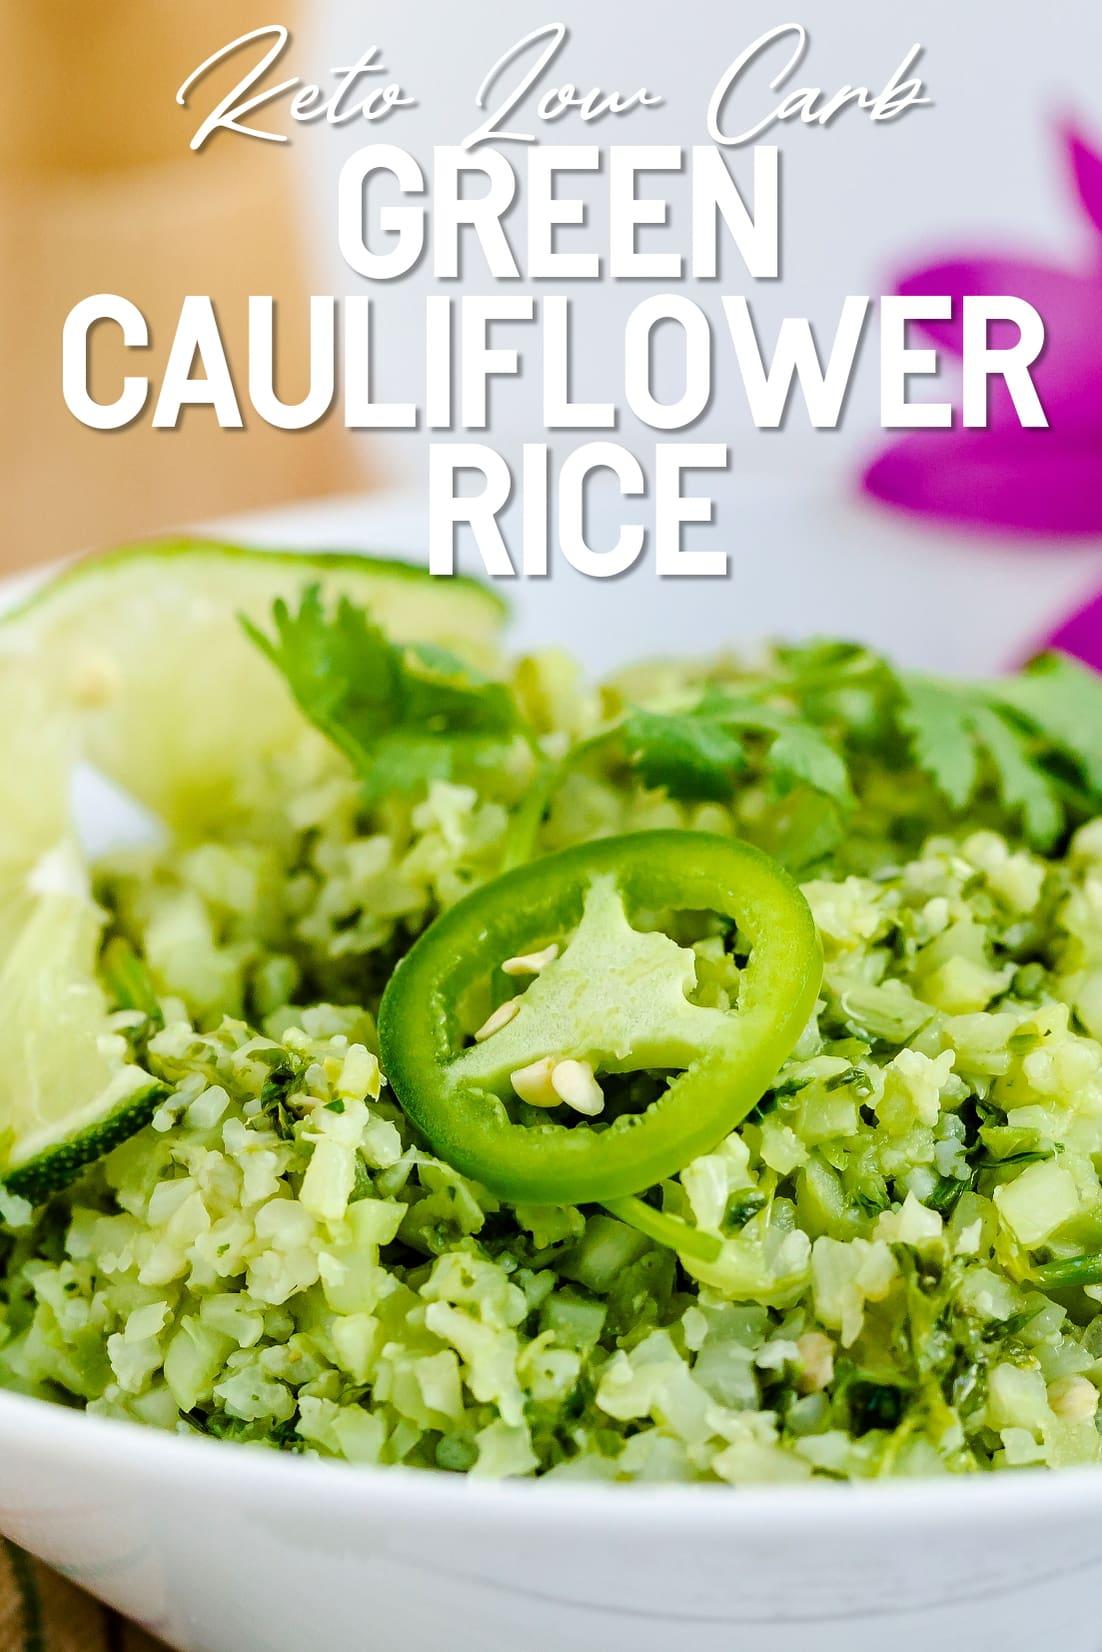 Green Cauliflower Rice Close Up